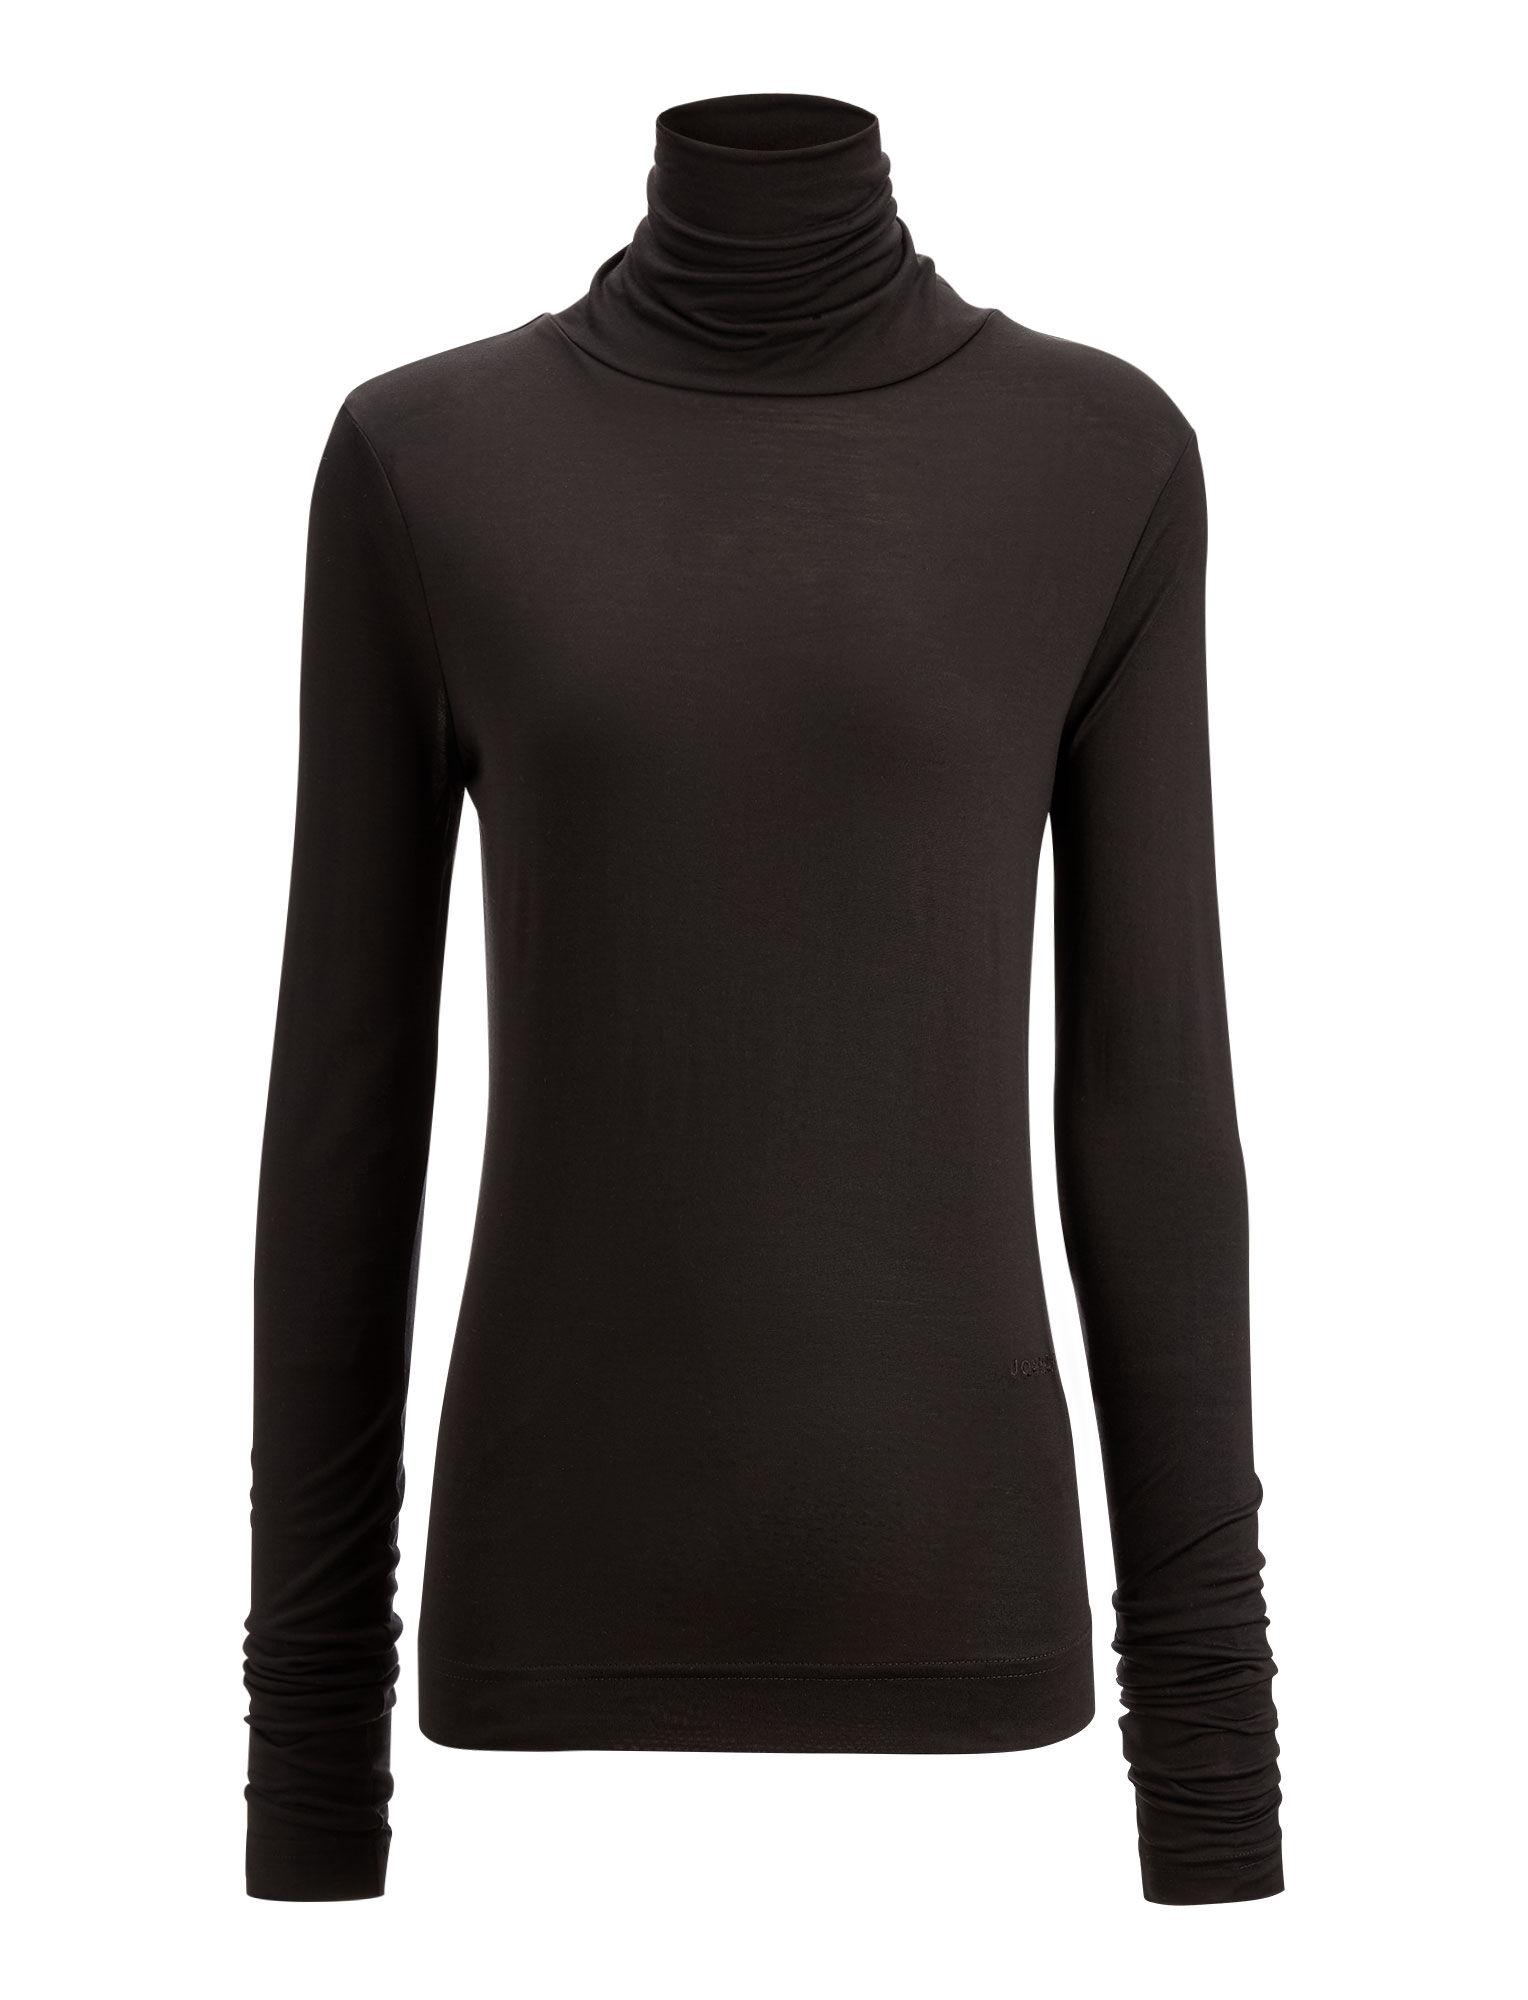 Joseph, Roll Neck Silk Jersey Top, in BLACK